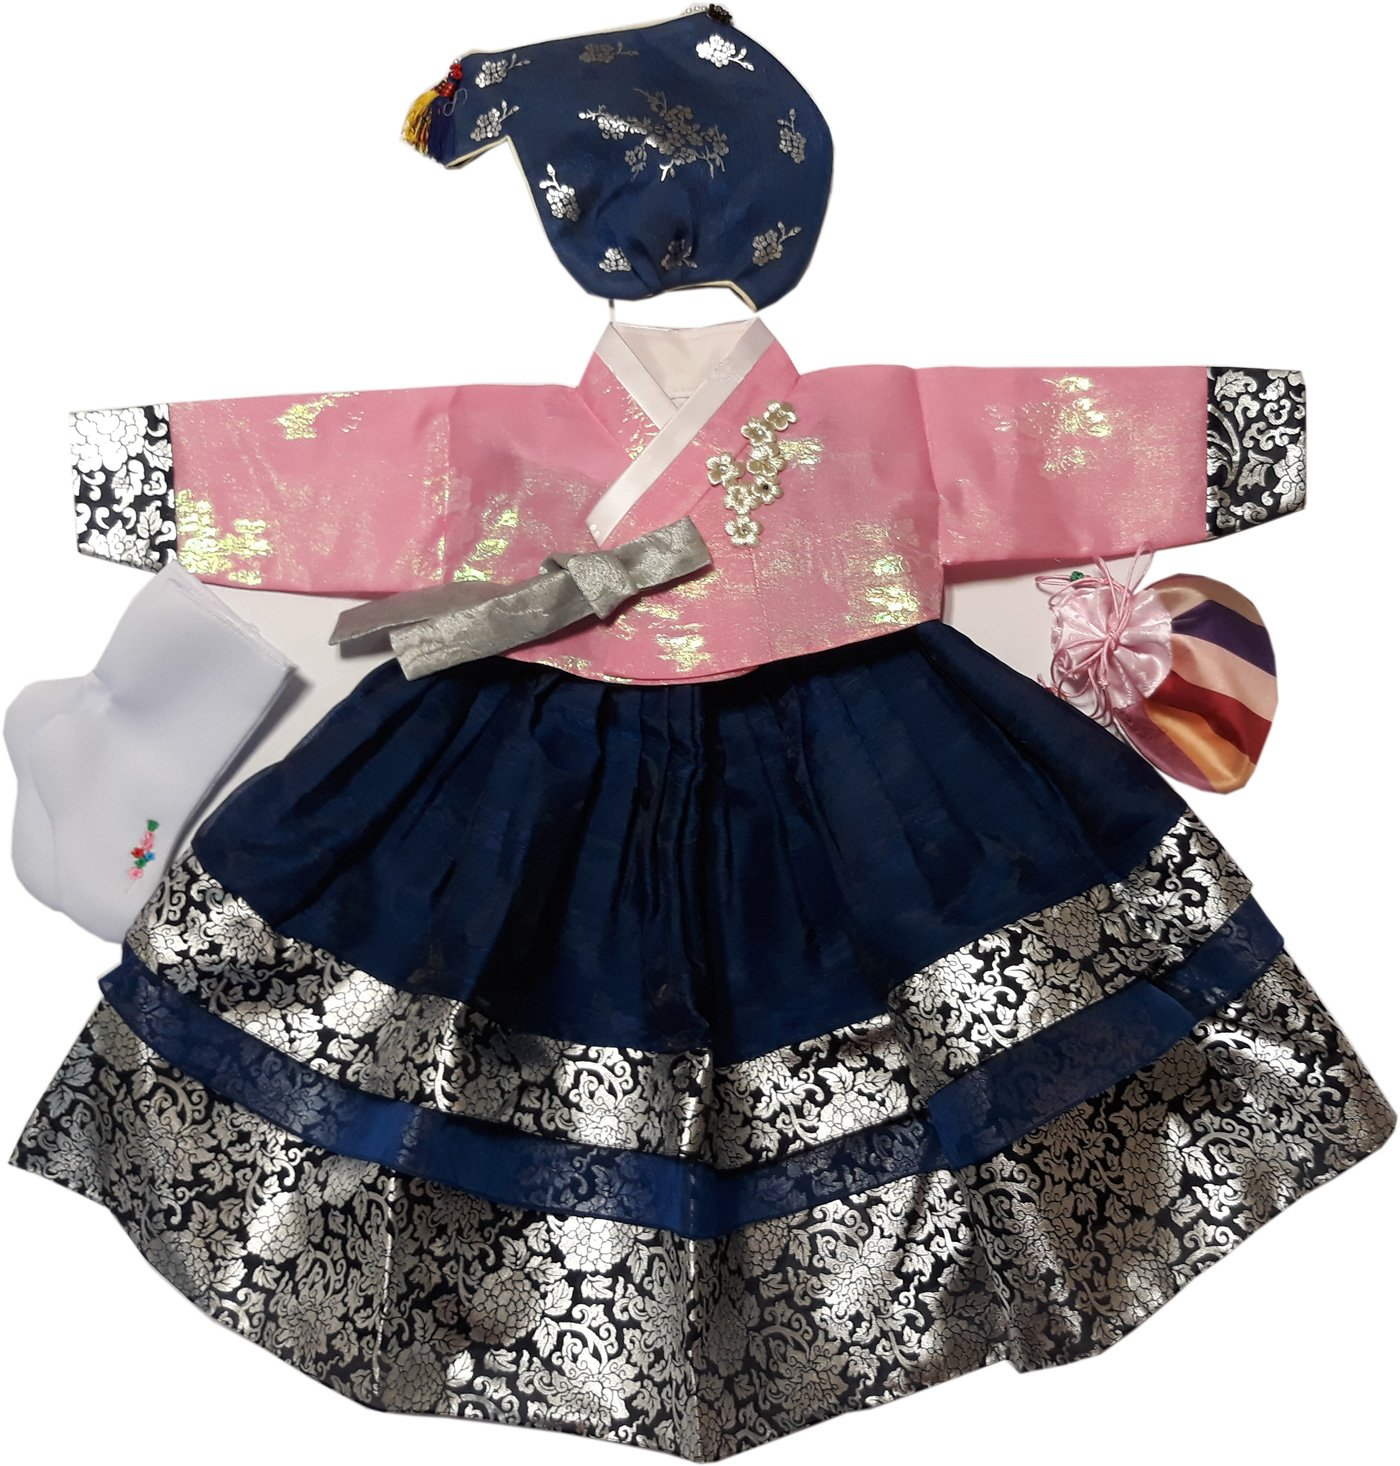 Hanboks Korean Traditional Costumes Girls Babies Dress 1st Birthday DOLBOK hg1004/1f